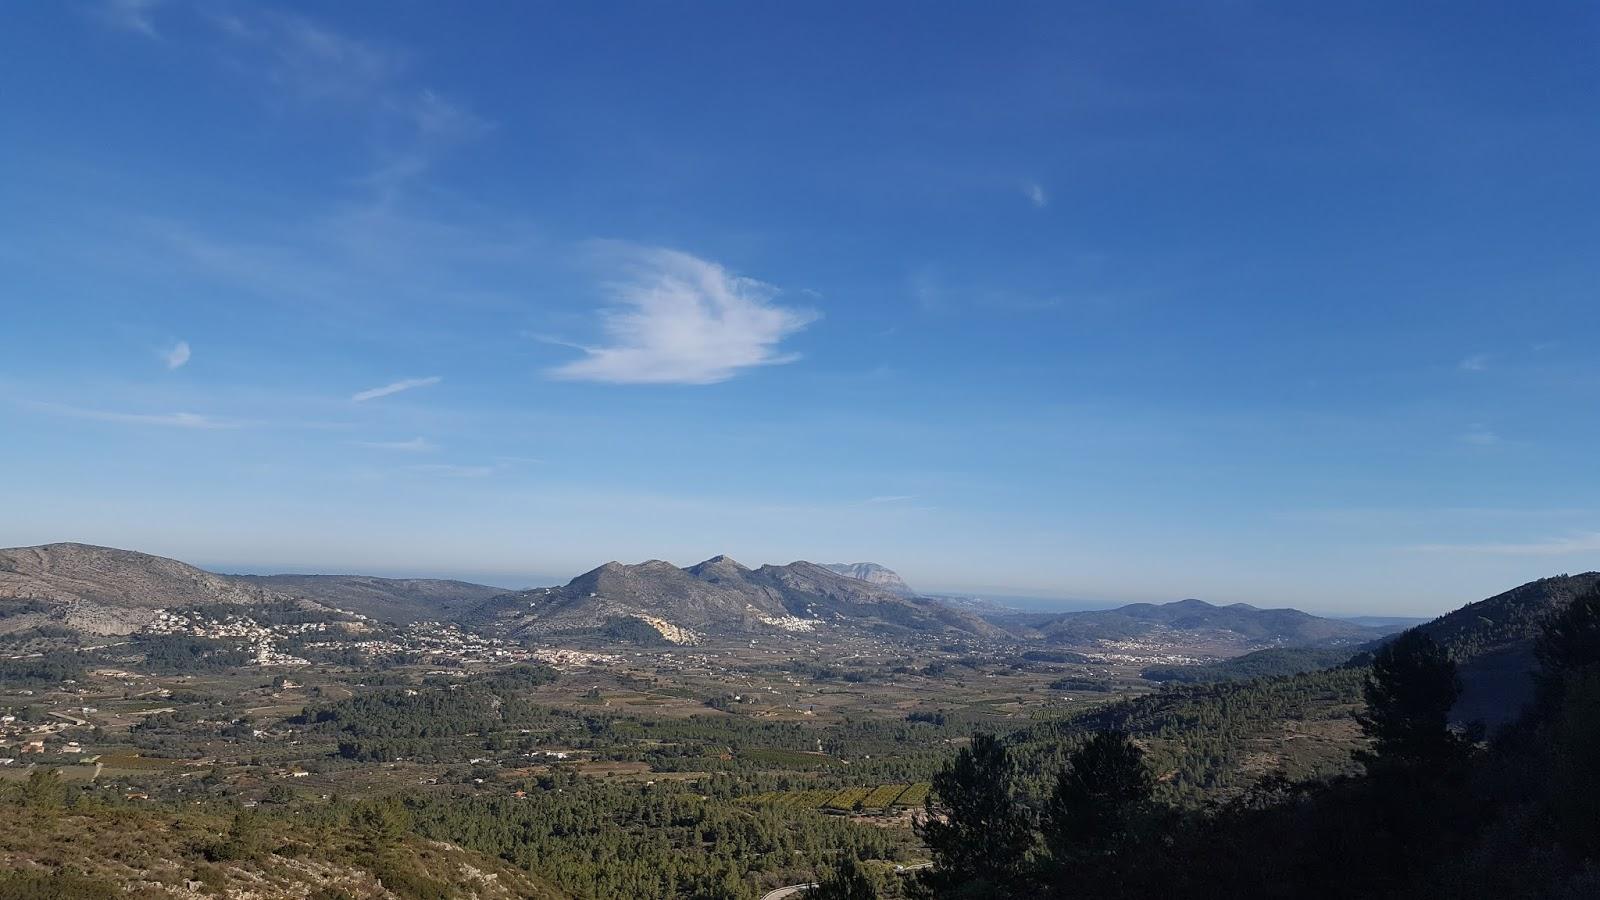 Pop Valley seen from Coll de Rates, Alicante, Spain